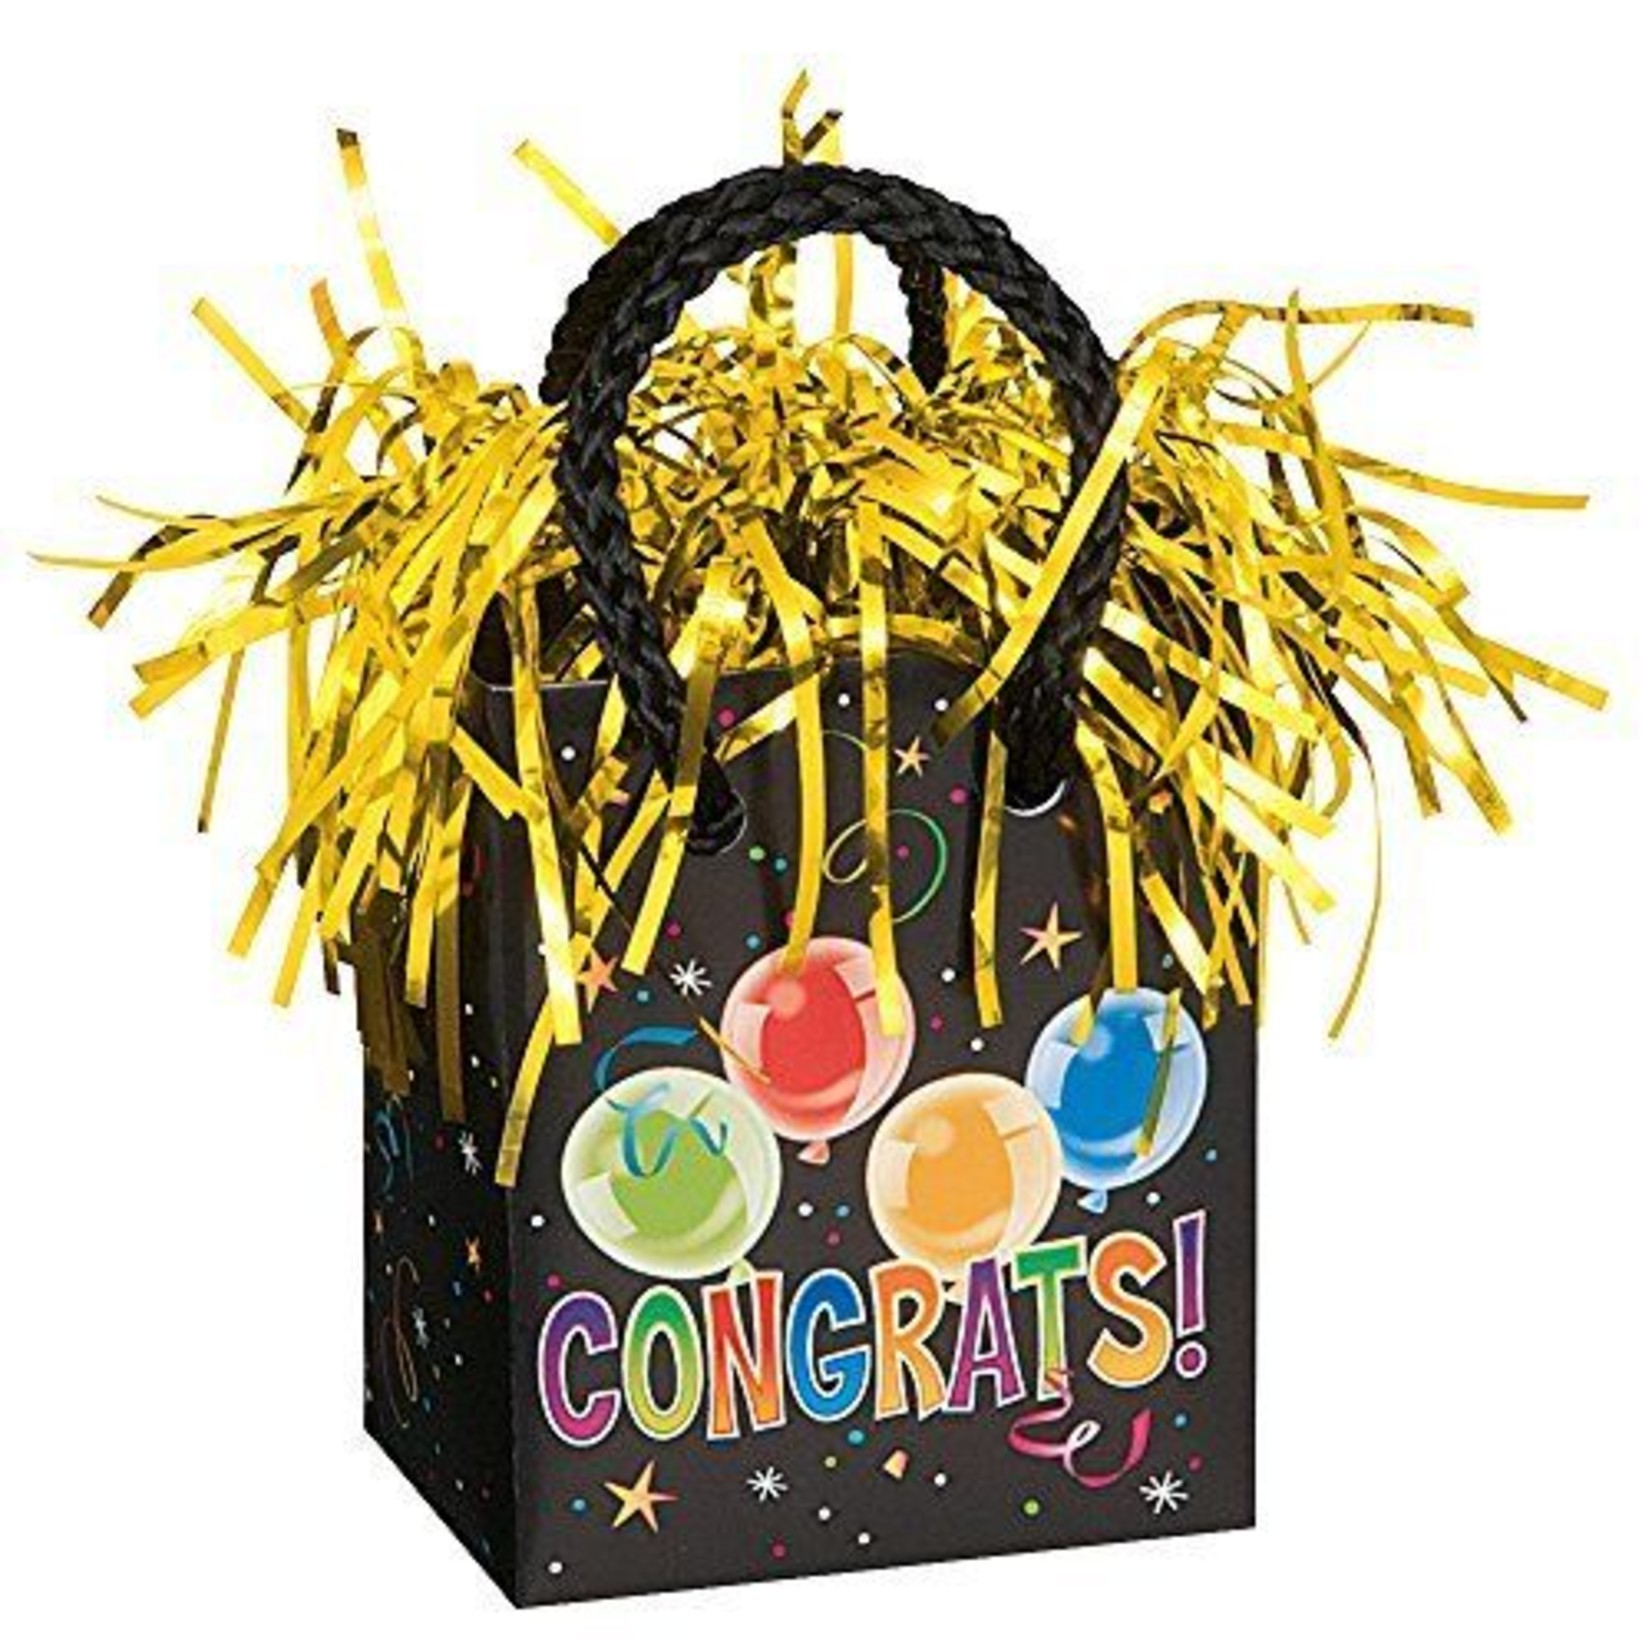 Balloon Weight-Congrats!-3''x2.5''